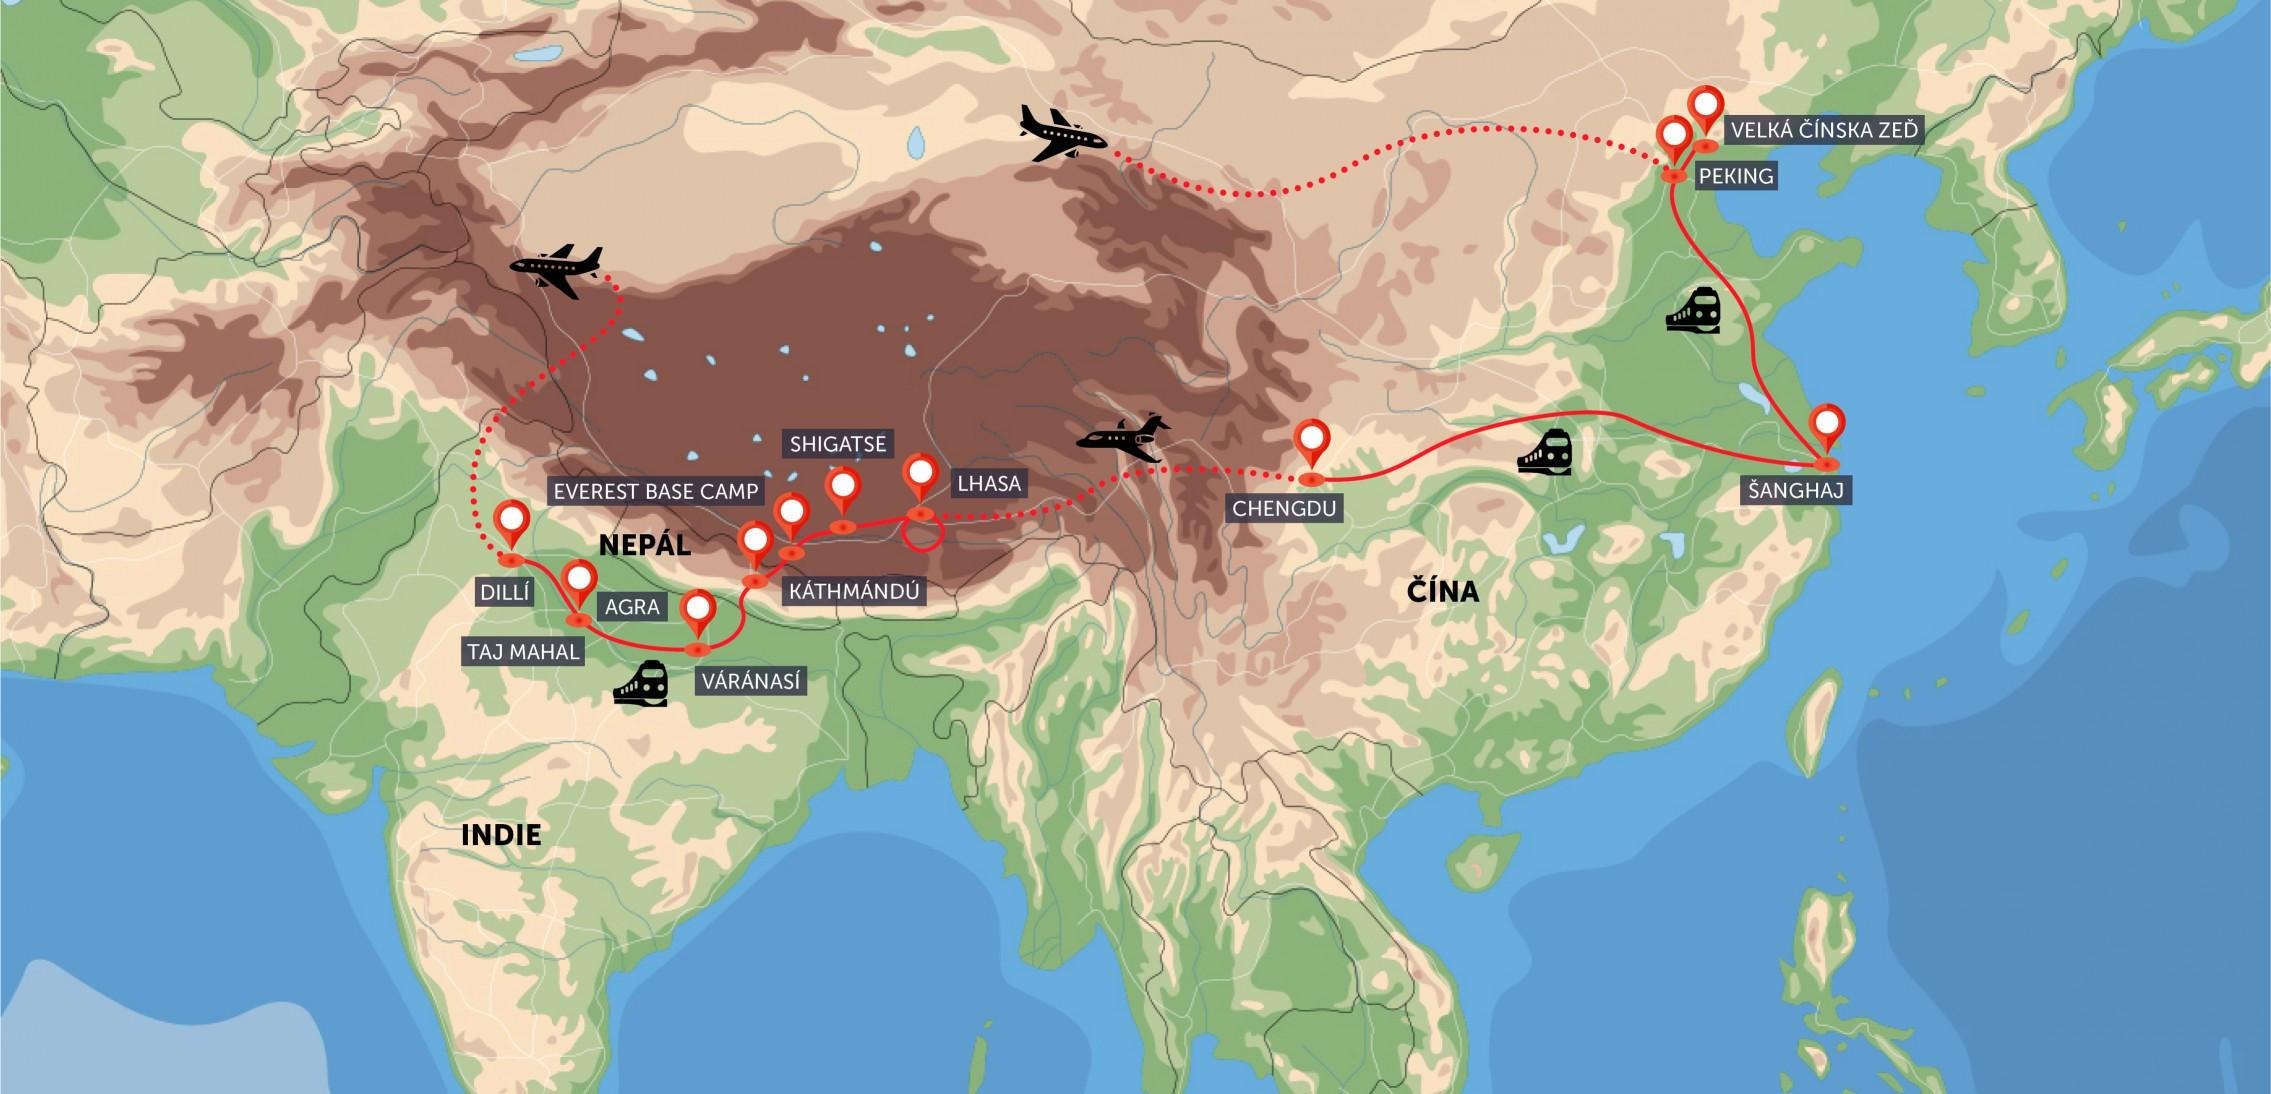 Čína, Tibet, Nepál, Indie